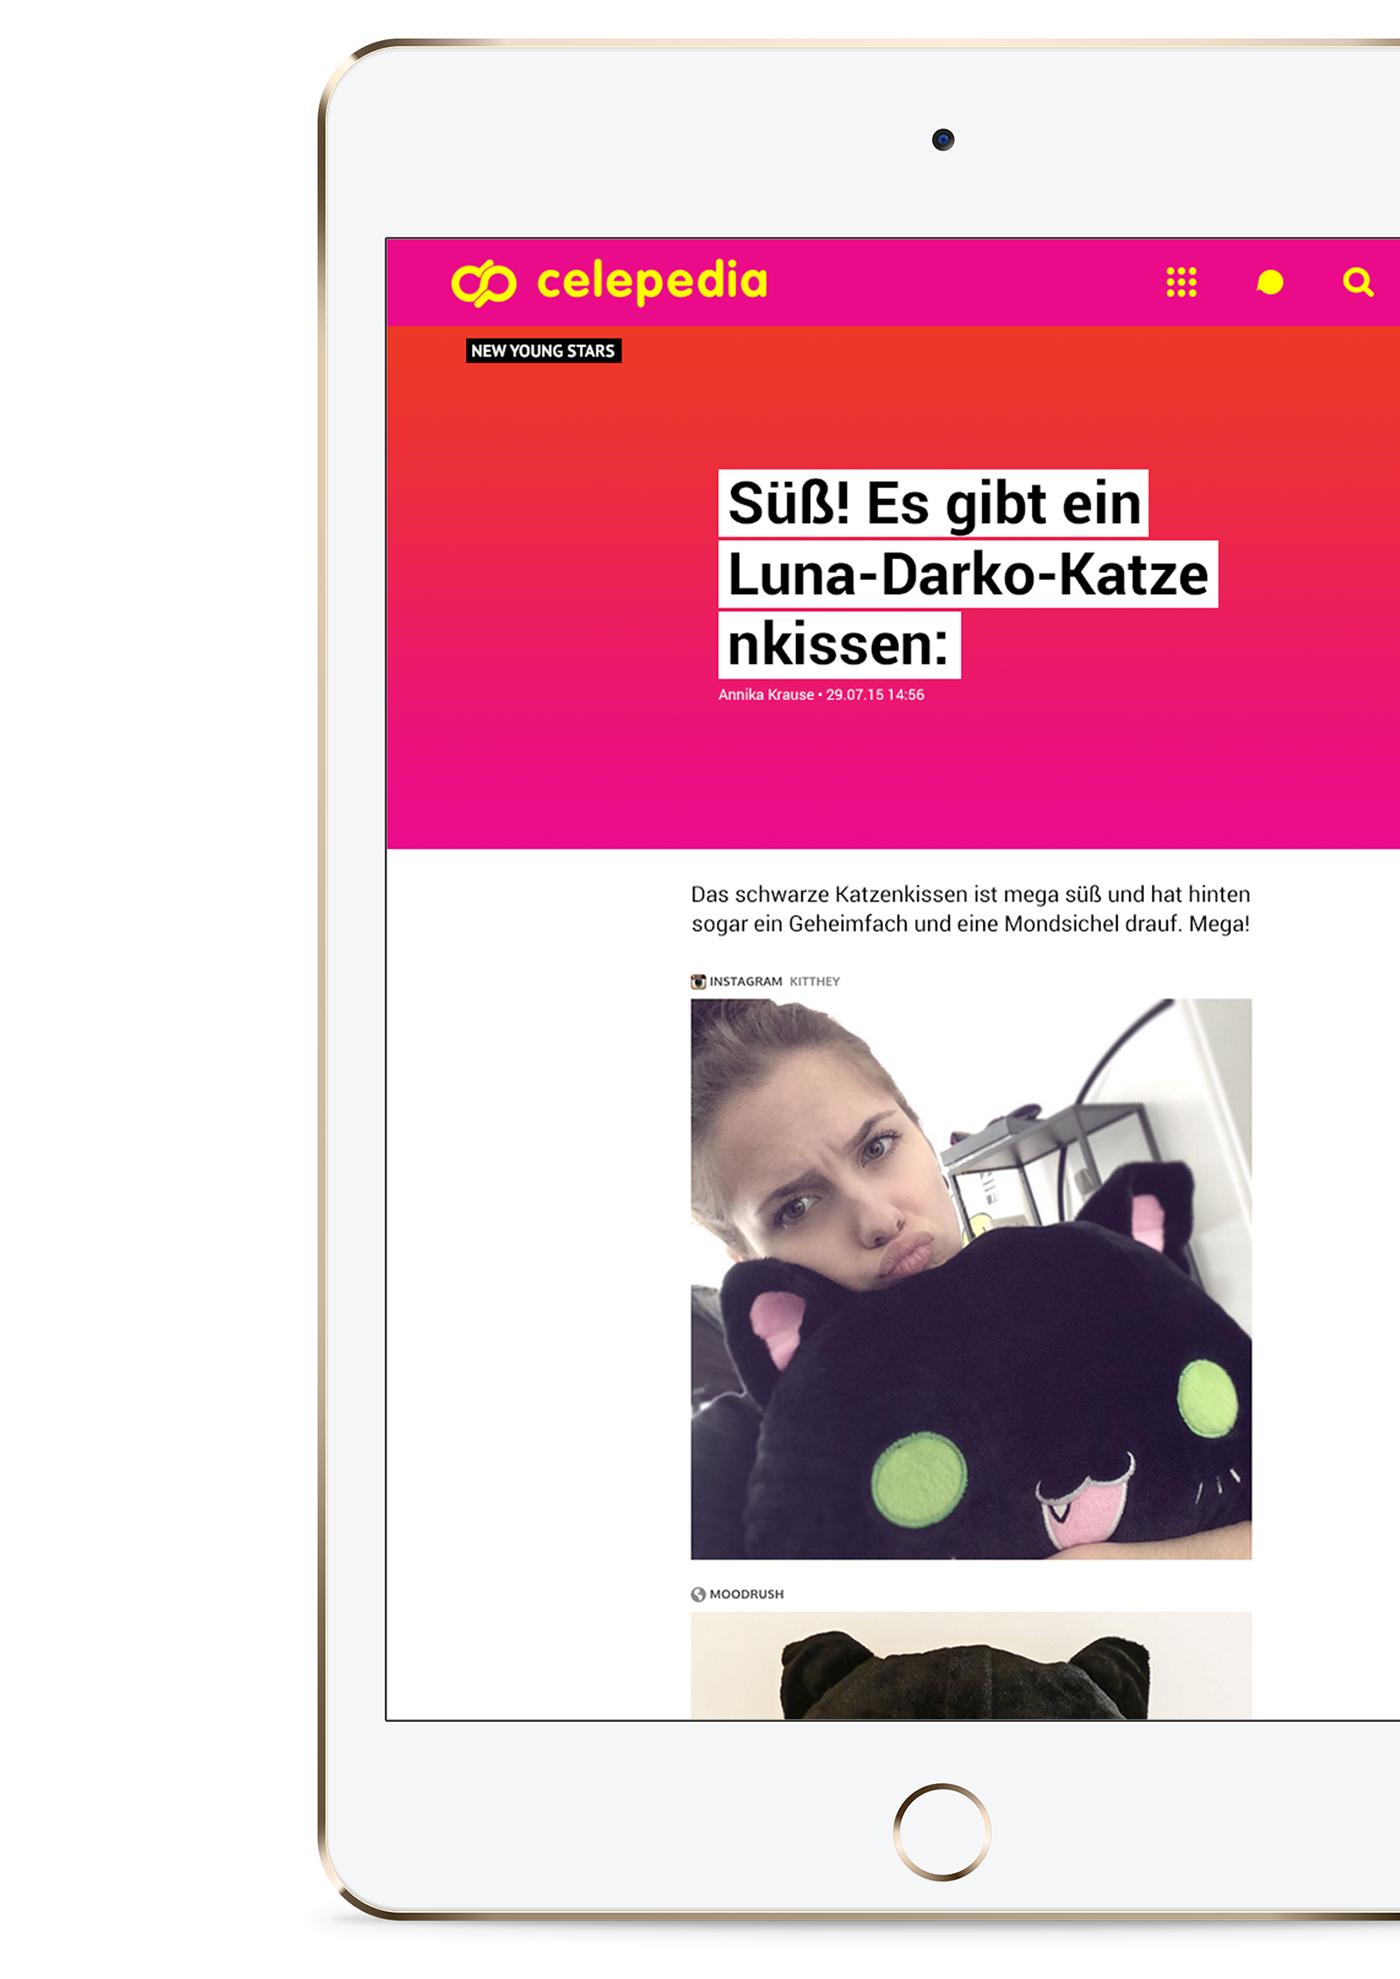 Celepedia Celebrity Webdesign Startup berlin Axel springer online visual identity design online magazine